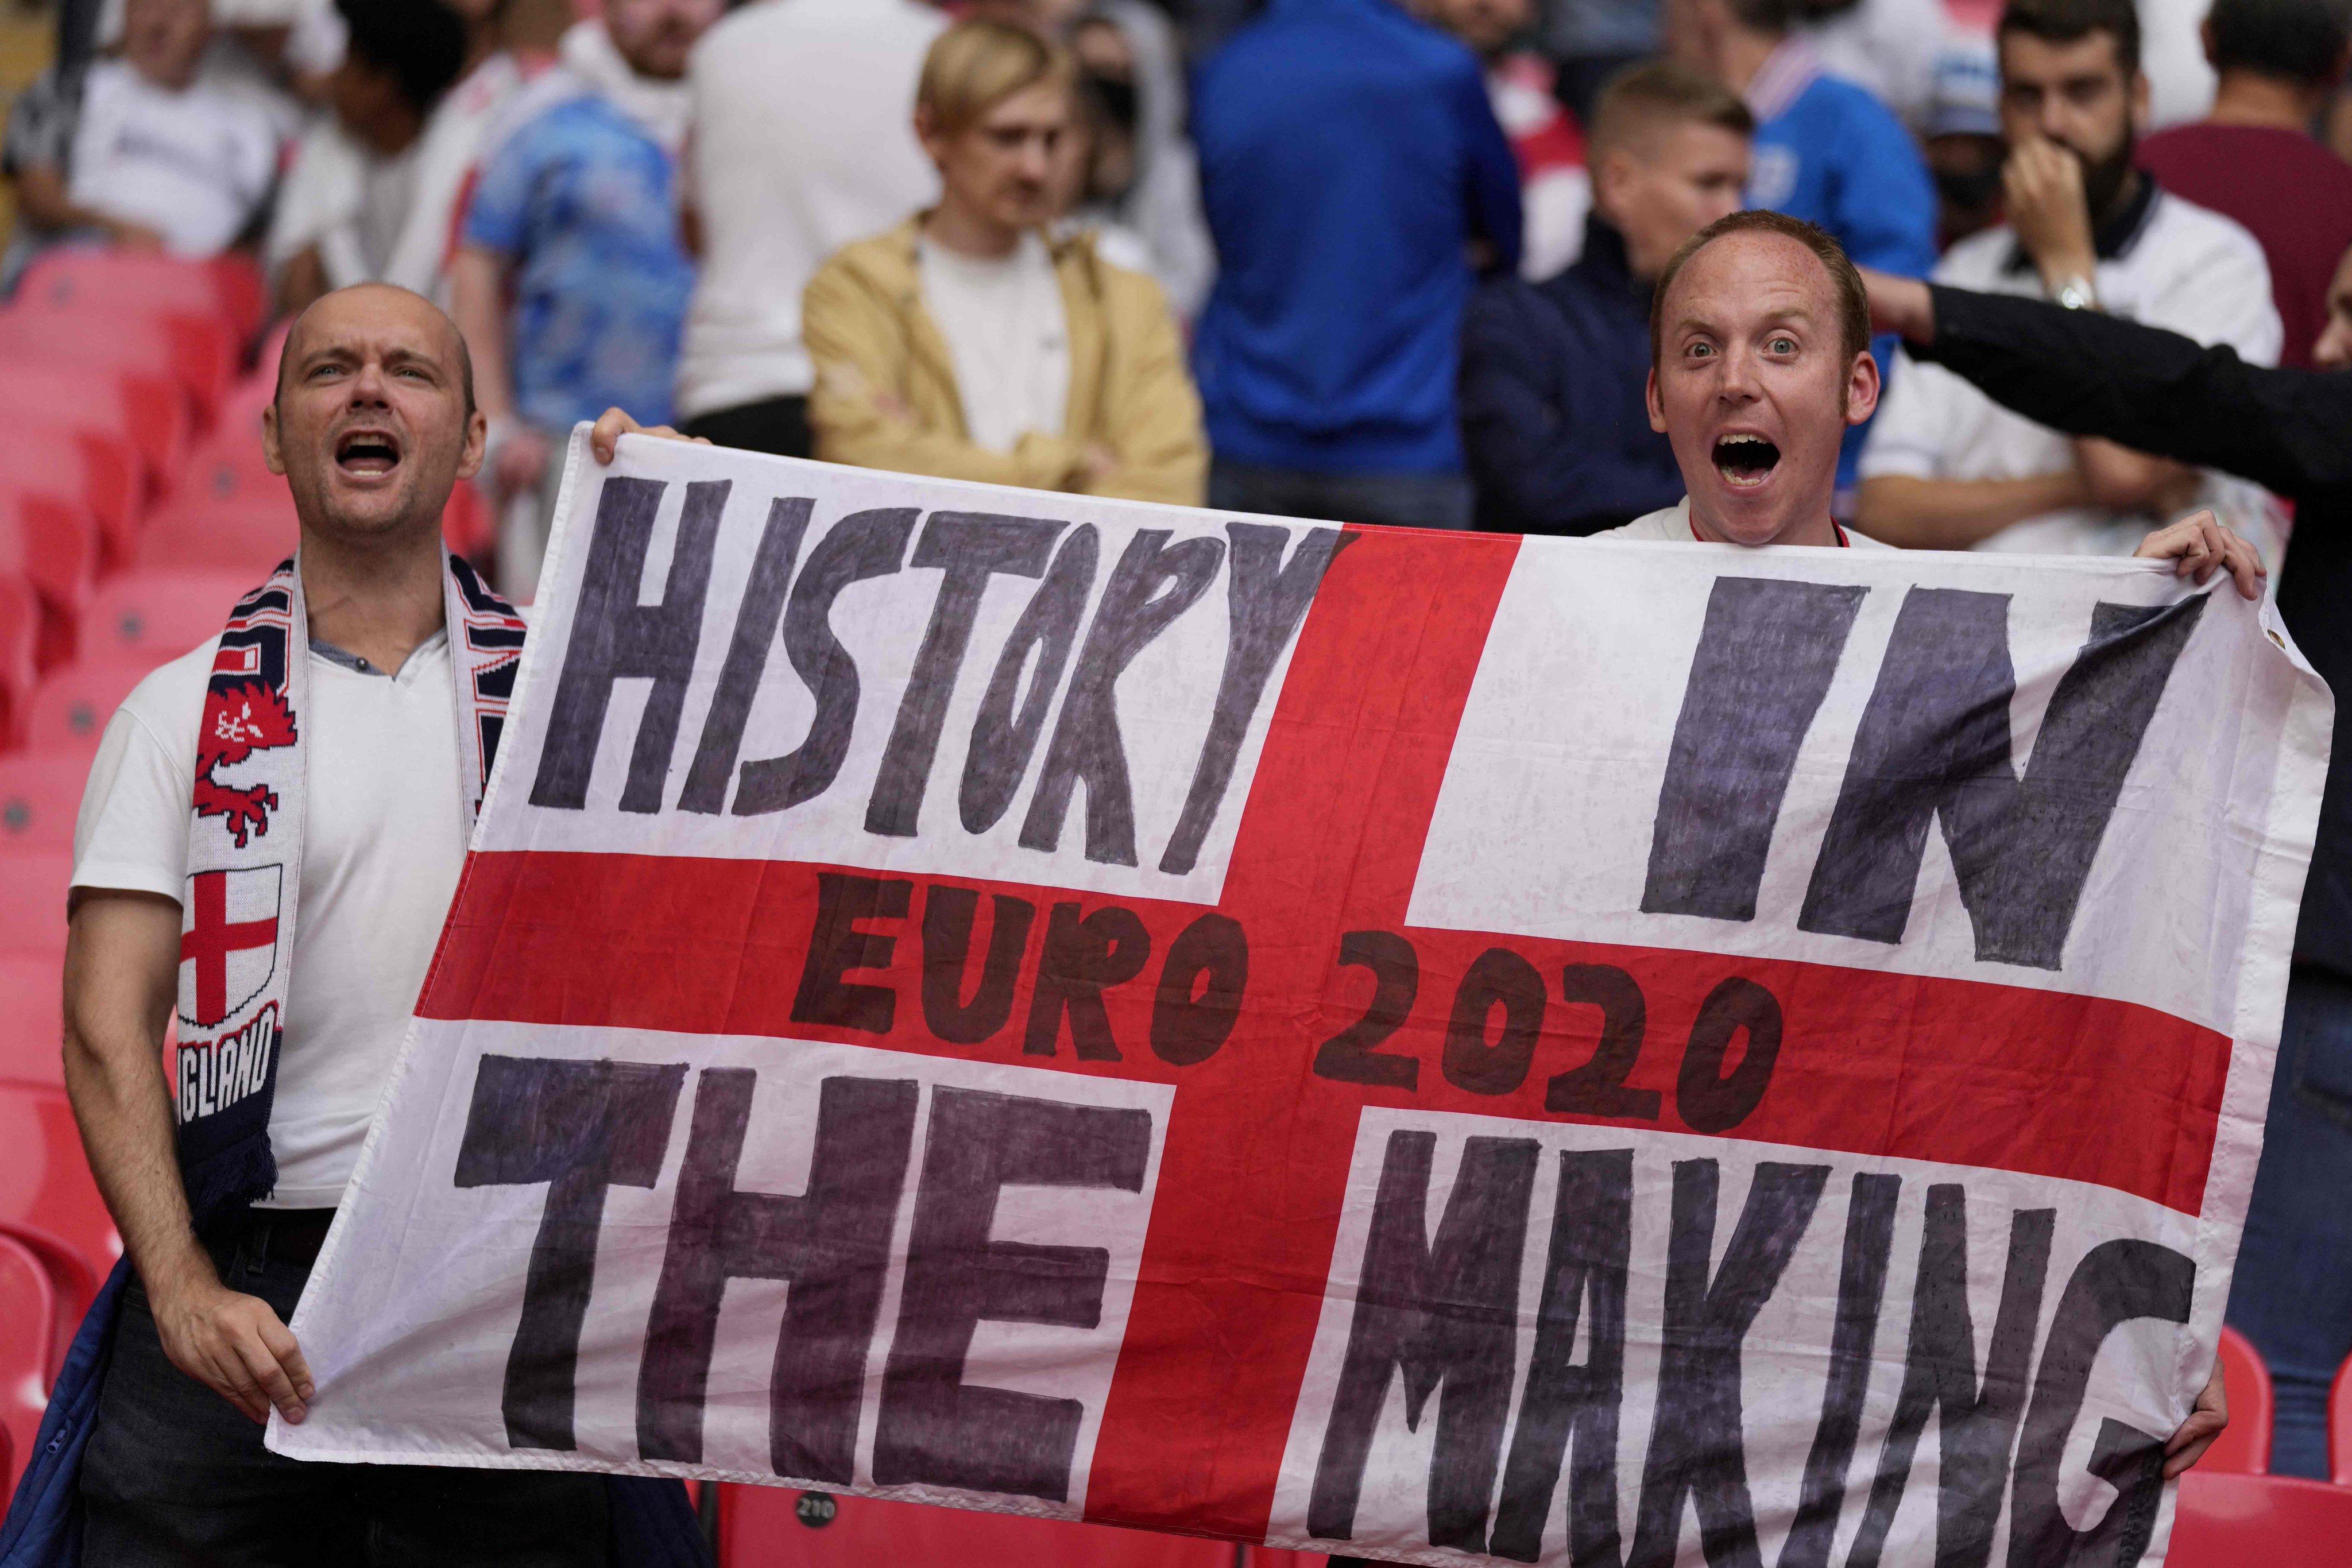 جماهير إنجلترا